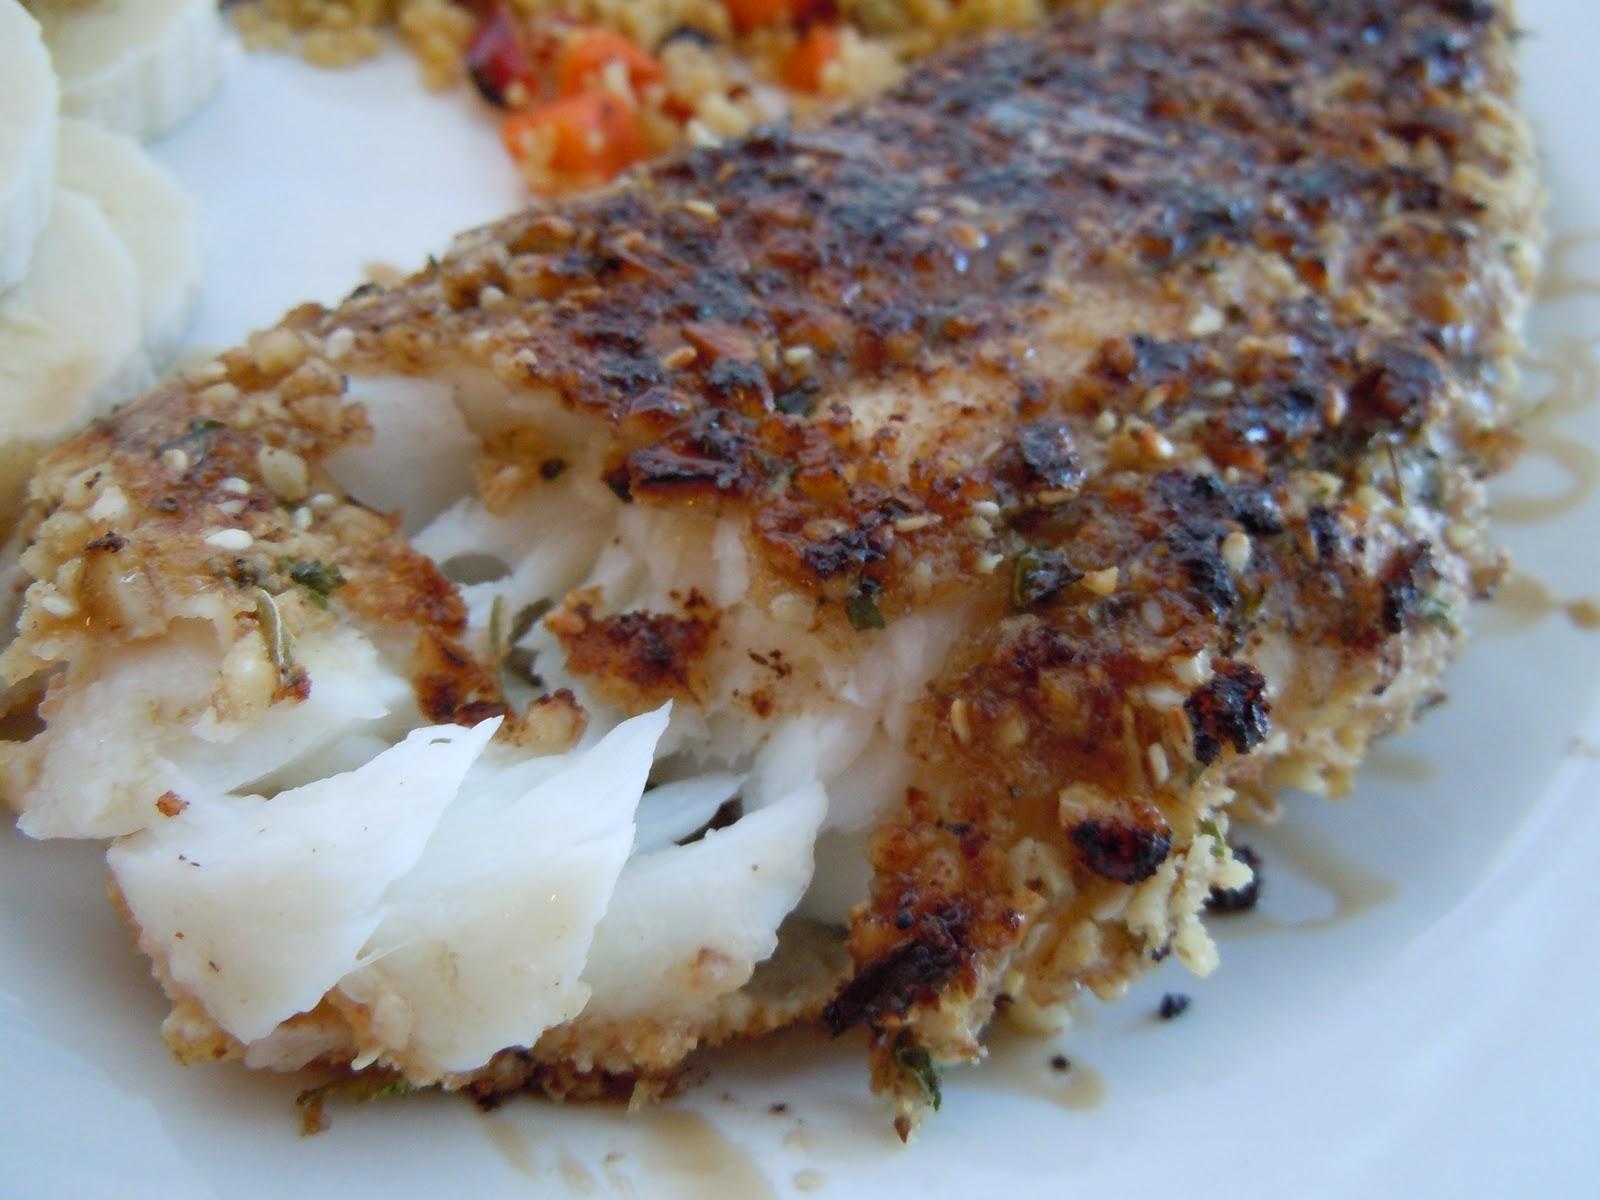 Fish Food Favorites: Nut-Crusted Orange Roughy